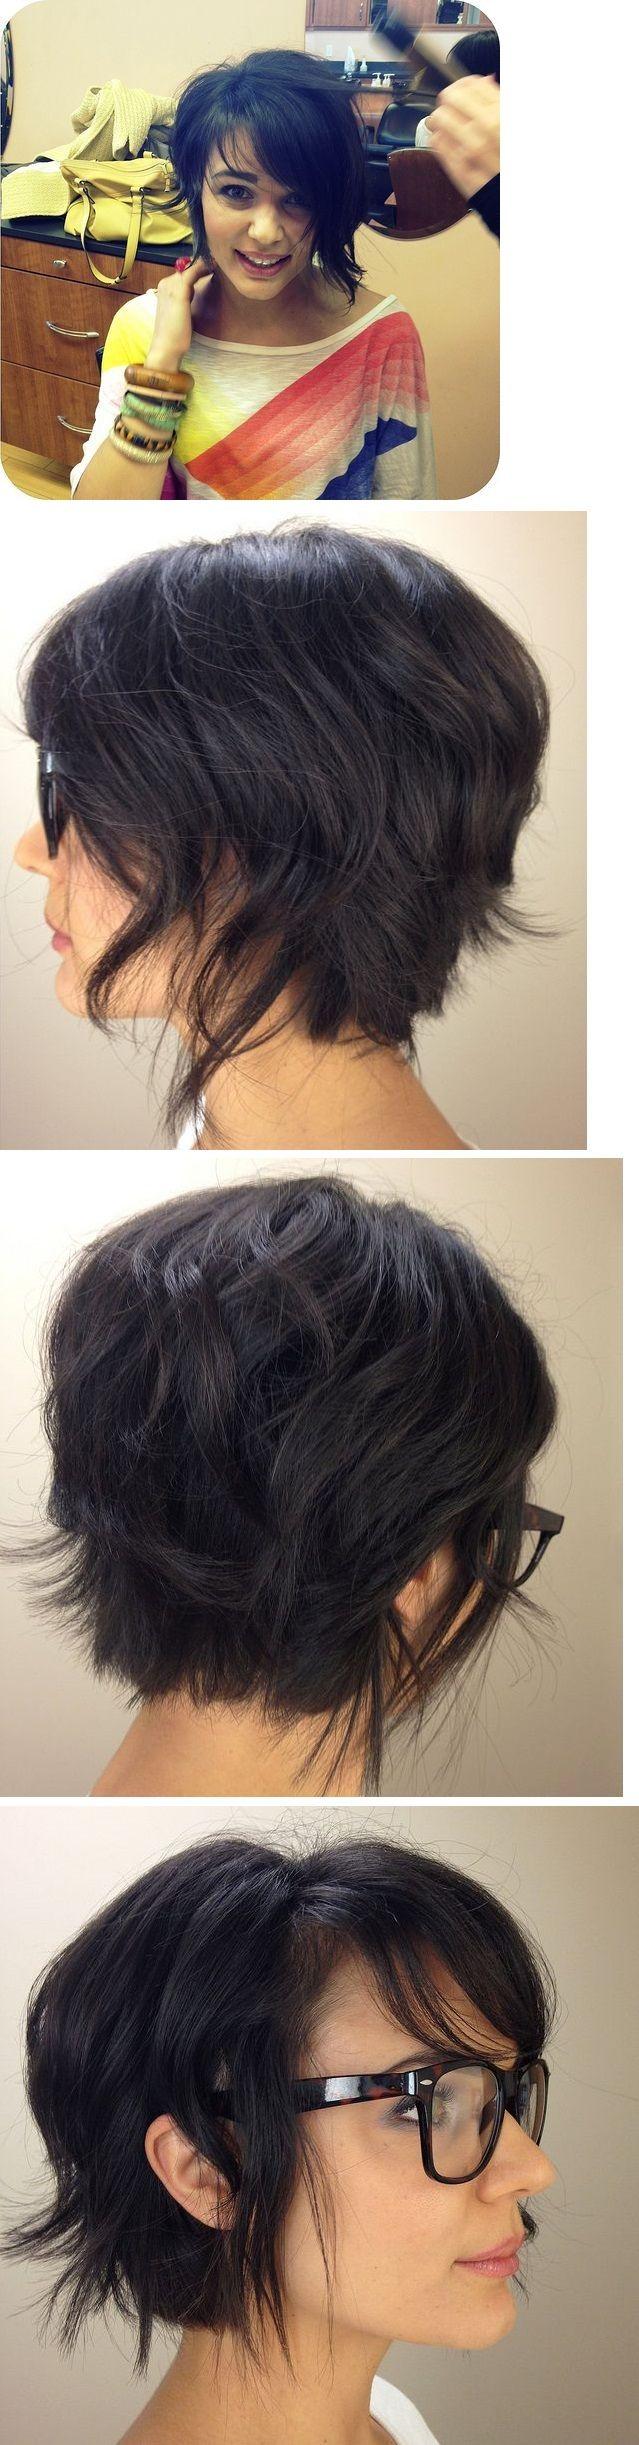 Corte de cabelo curto, desfiado, moderno